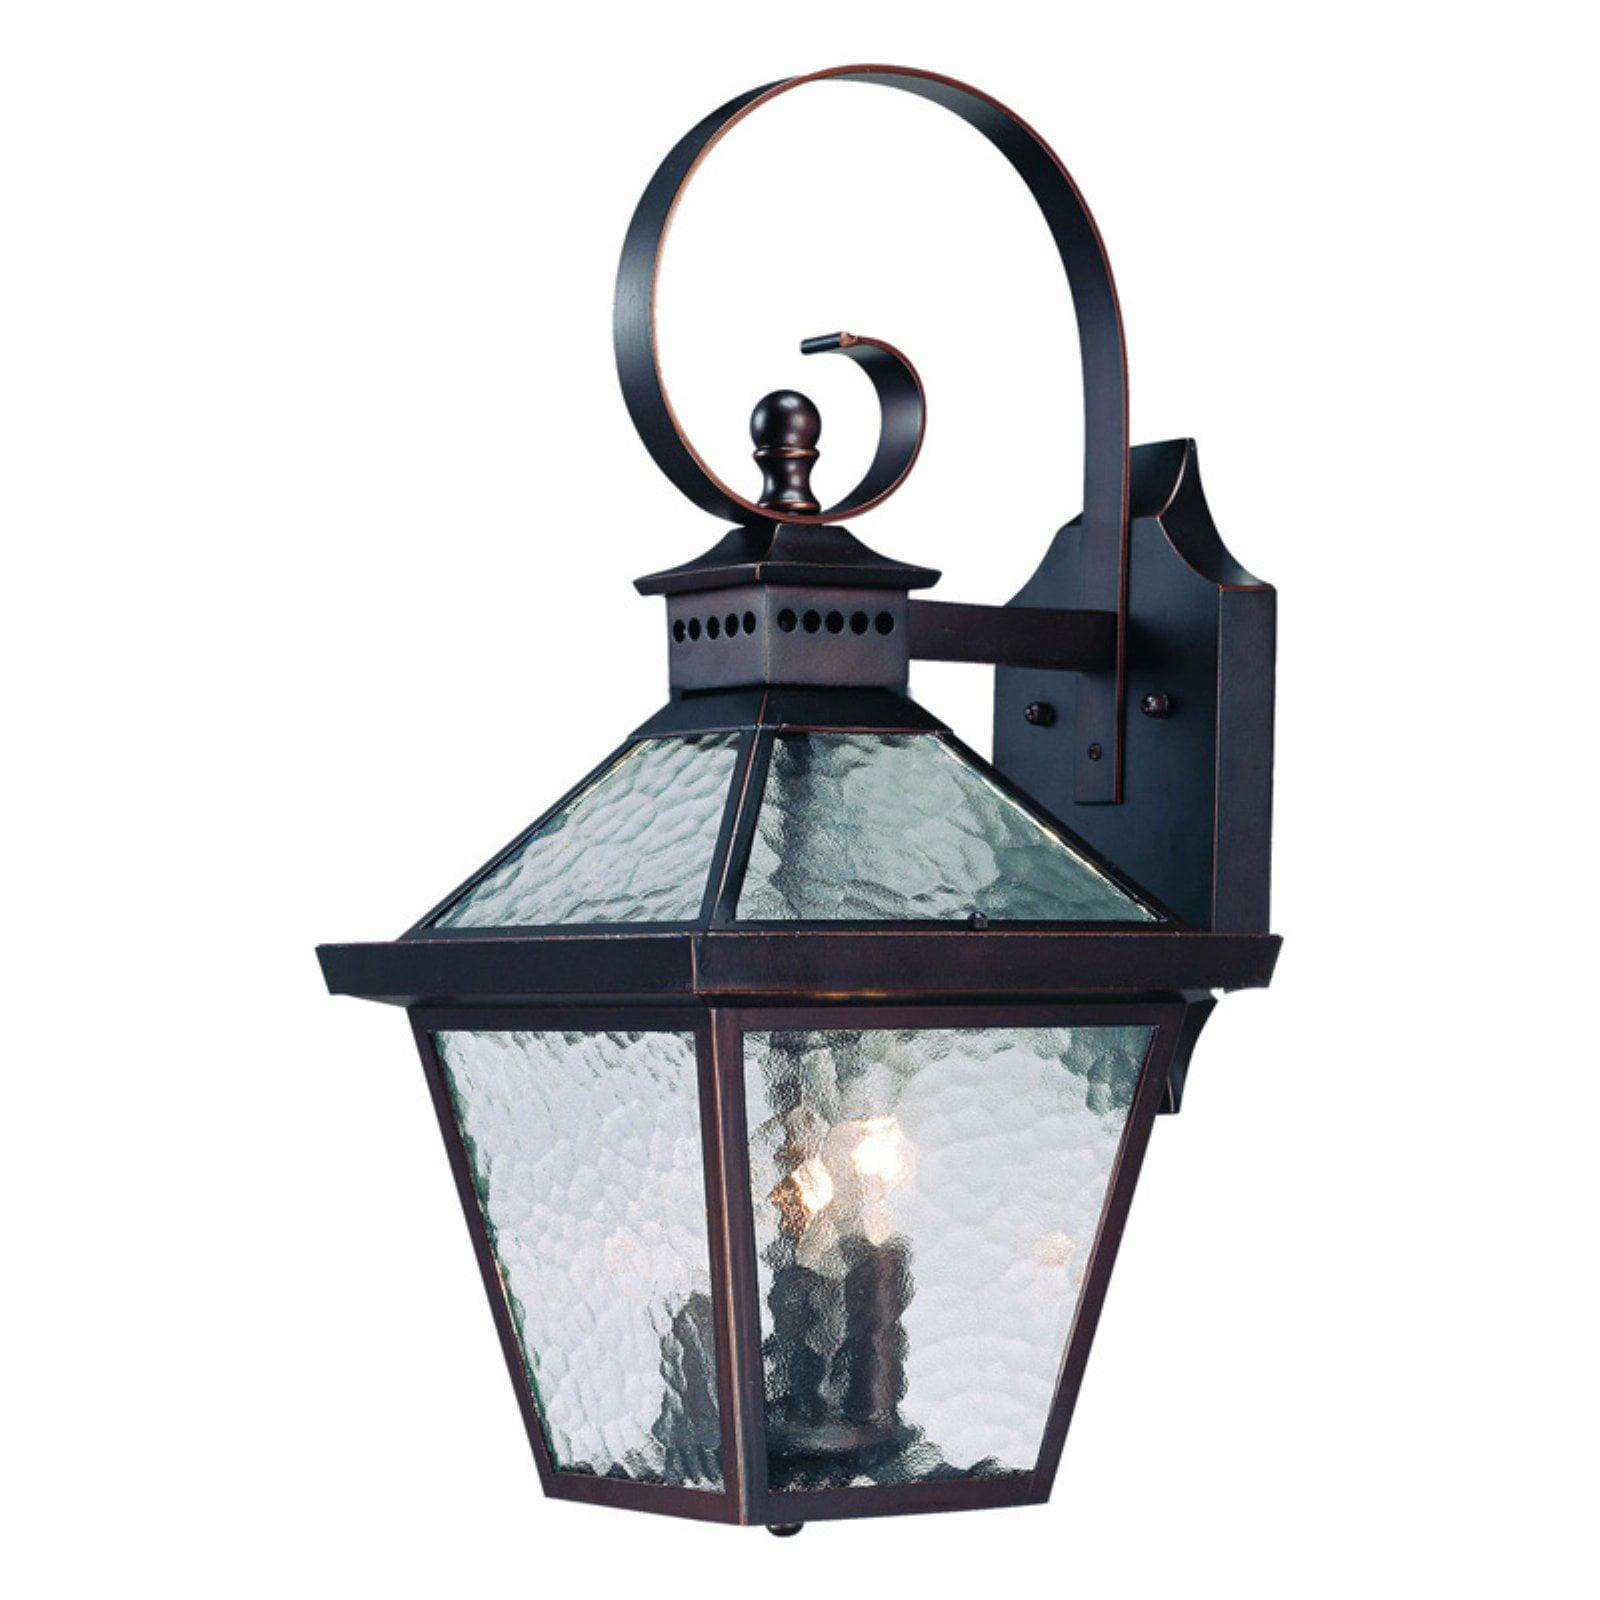 Acclaim Lighting Bay Street 3 Light Outdoor Wall Mount Light Fixture